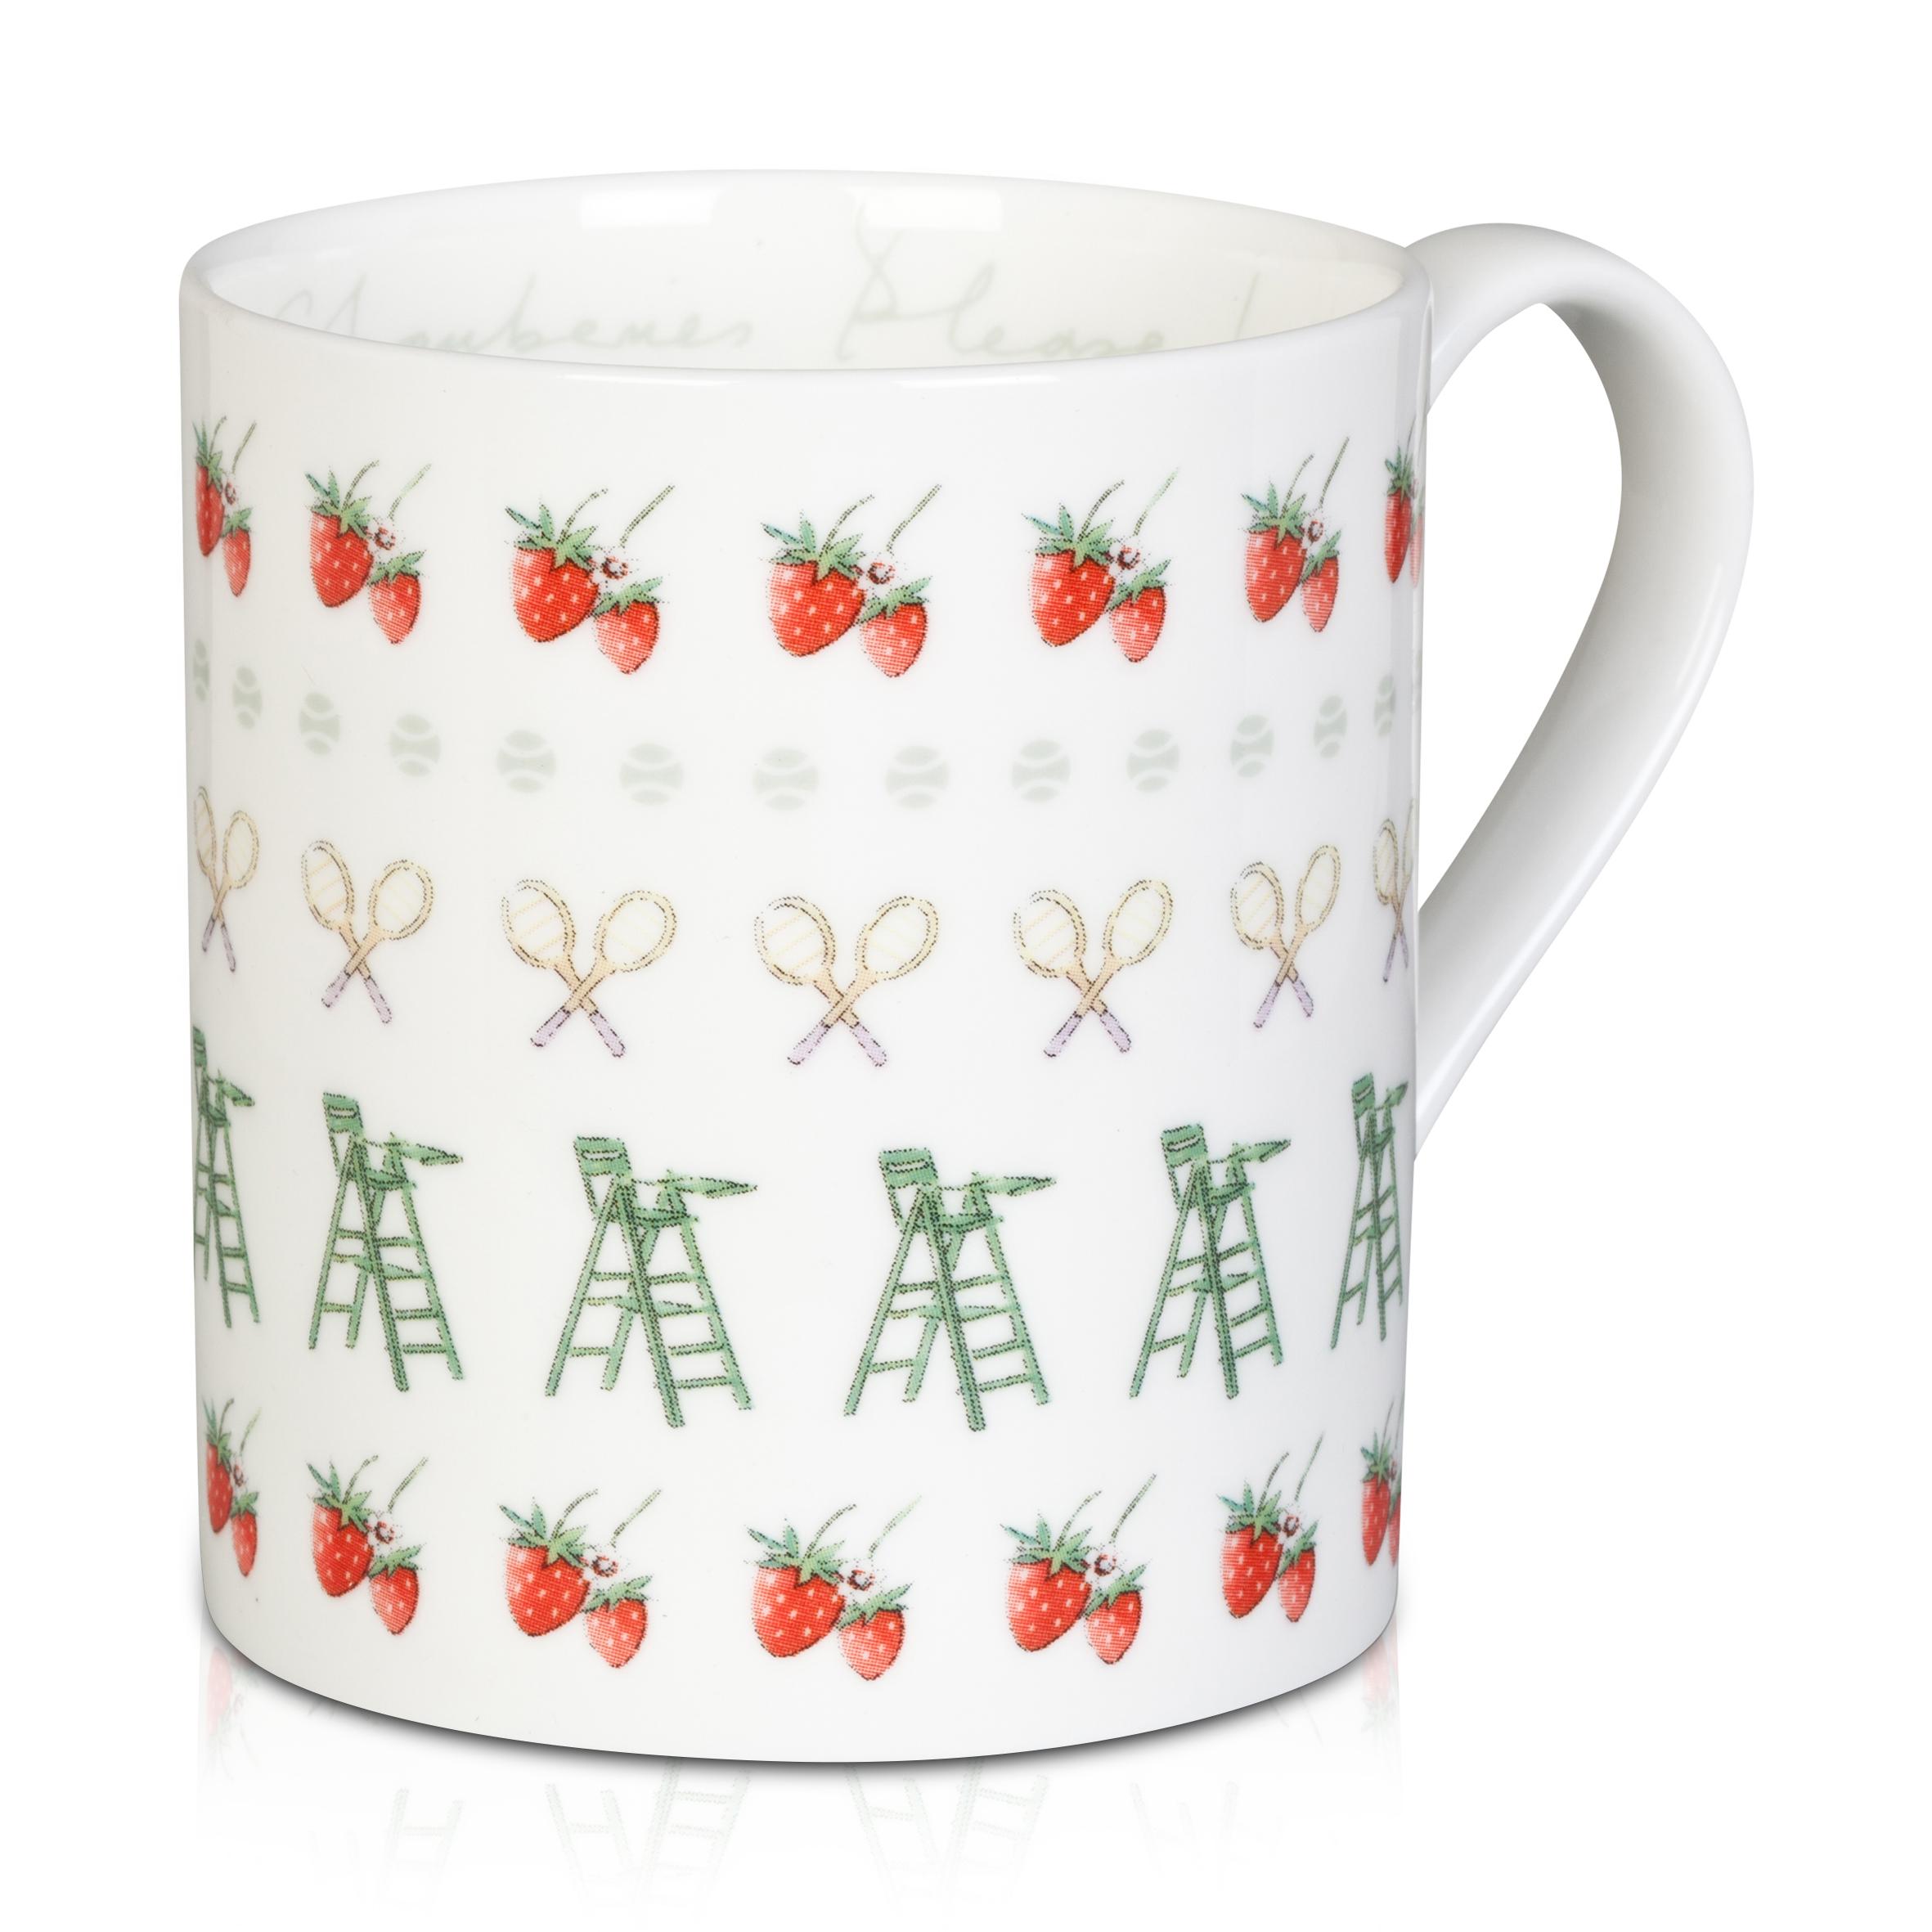 Wimbledon 'More Strawberries' Mug - White